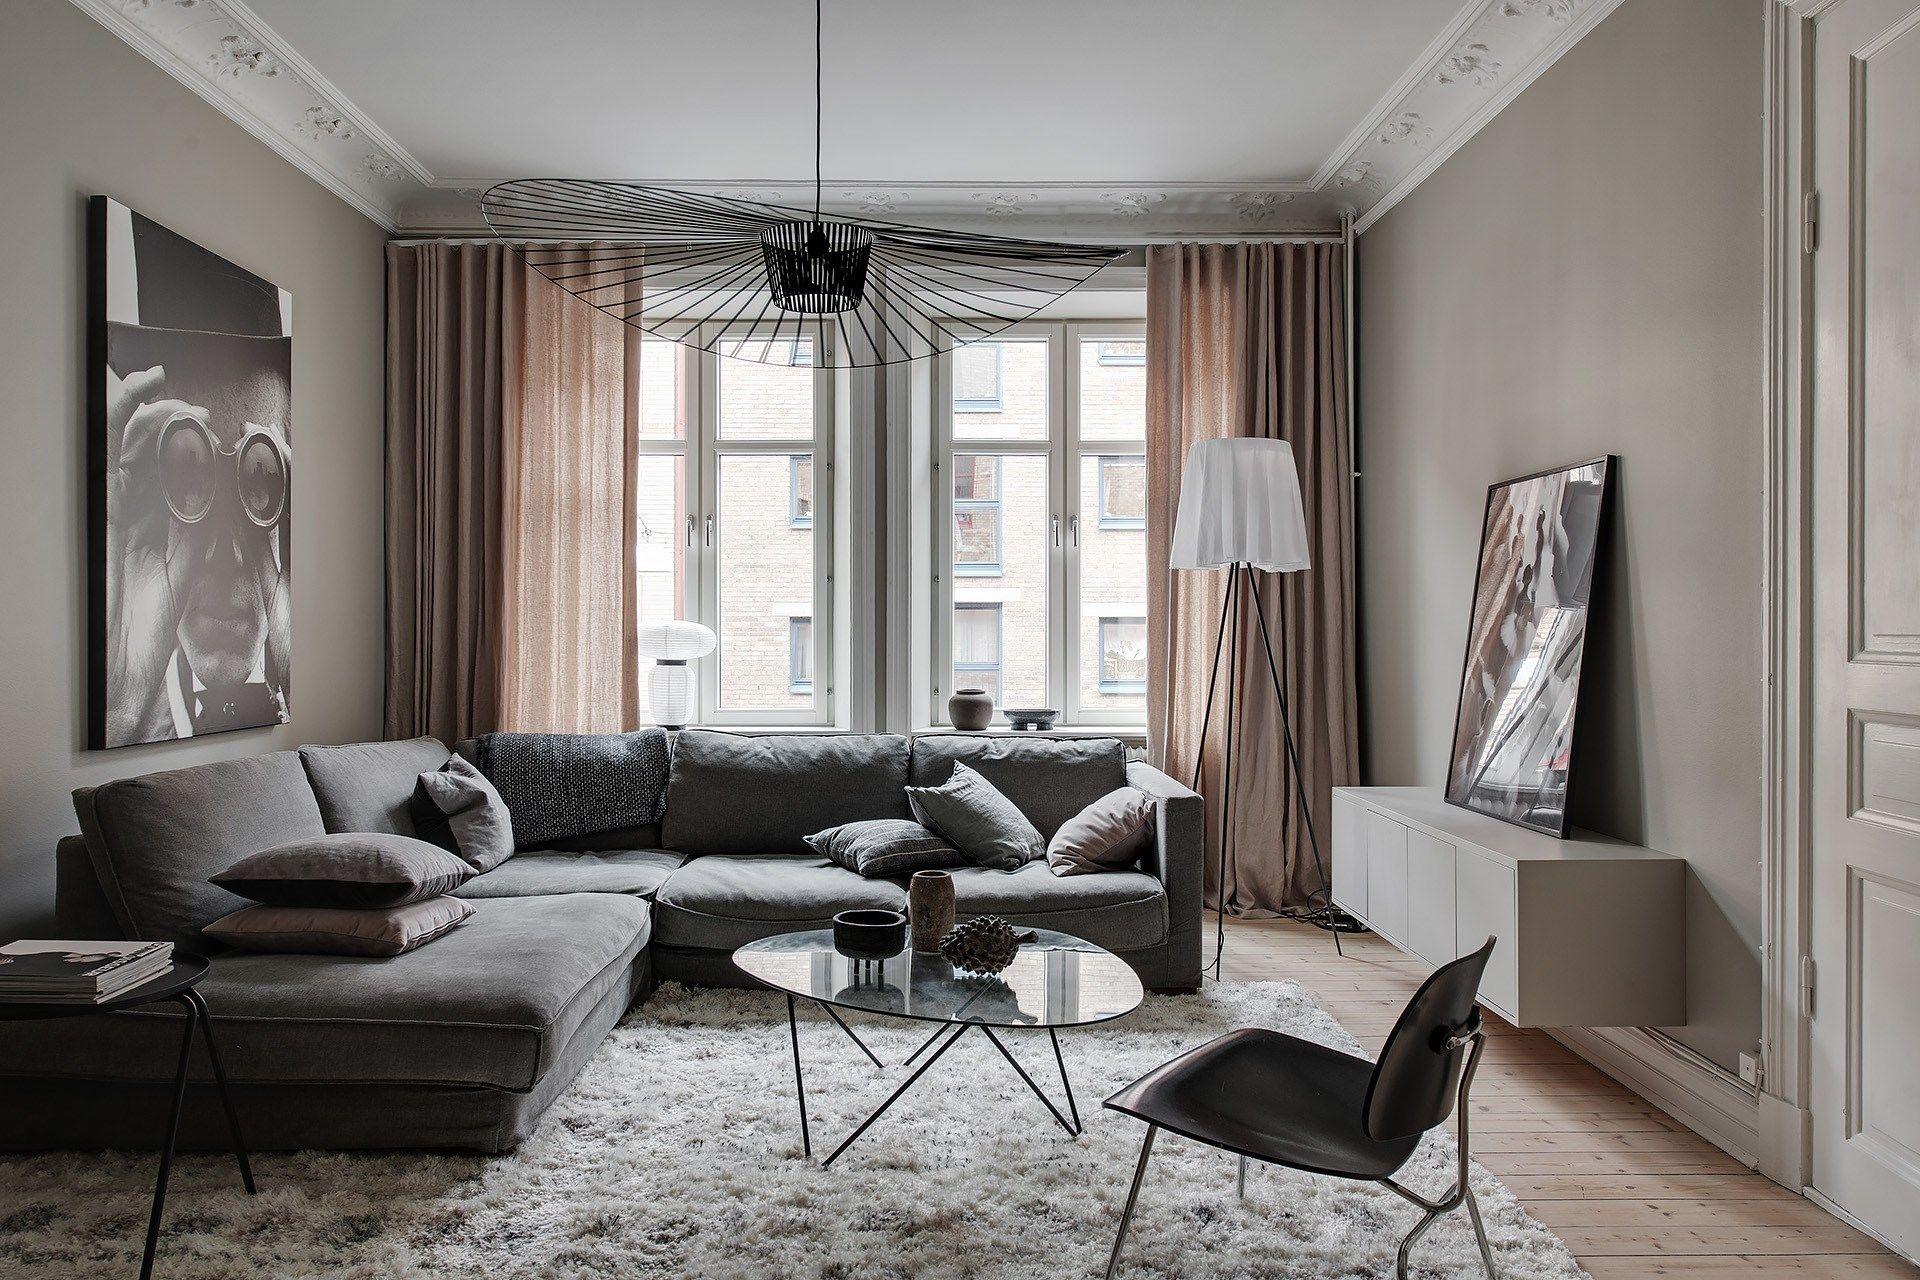 Stylish Home In Beige Vardagsrum Inspiration Hem Vardagsrum